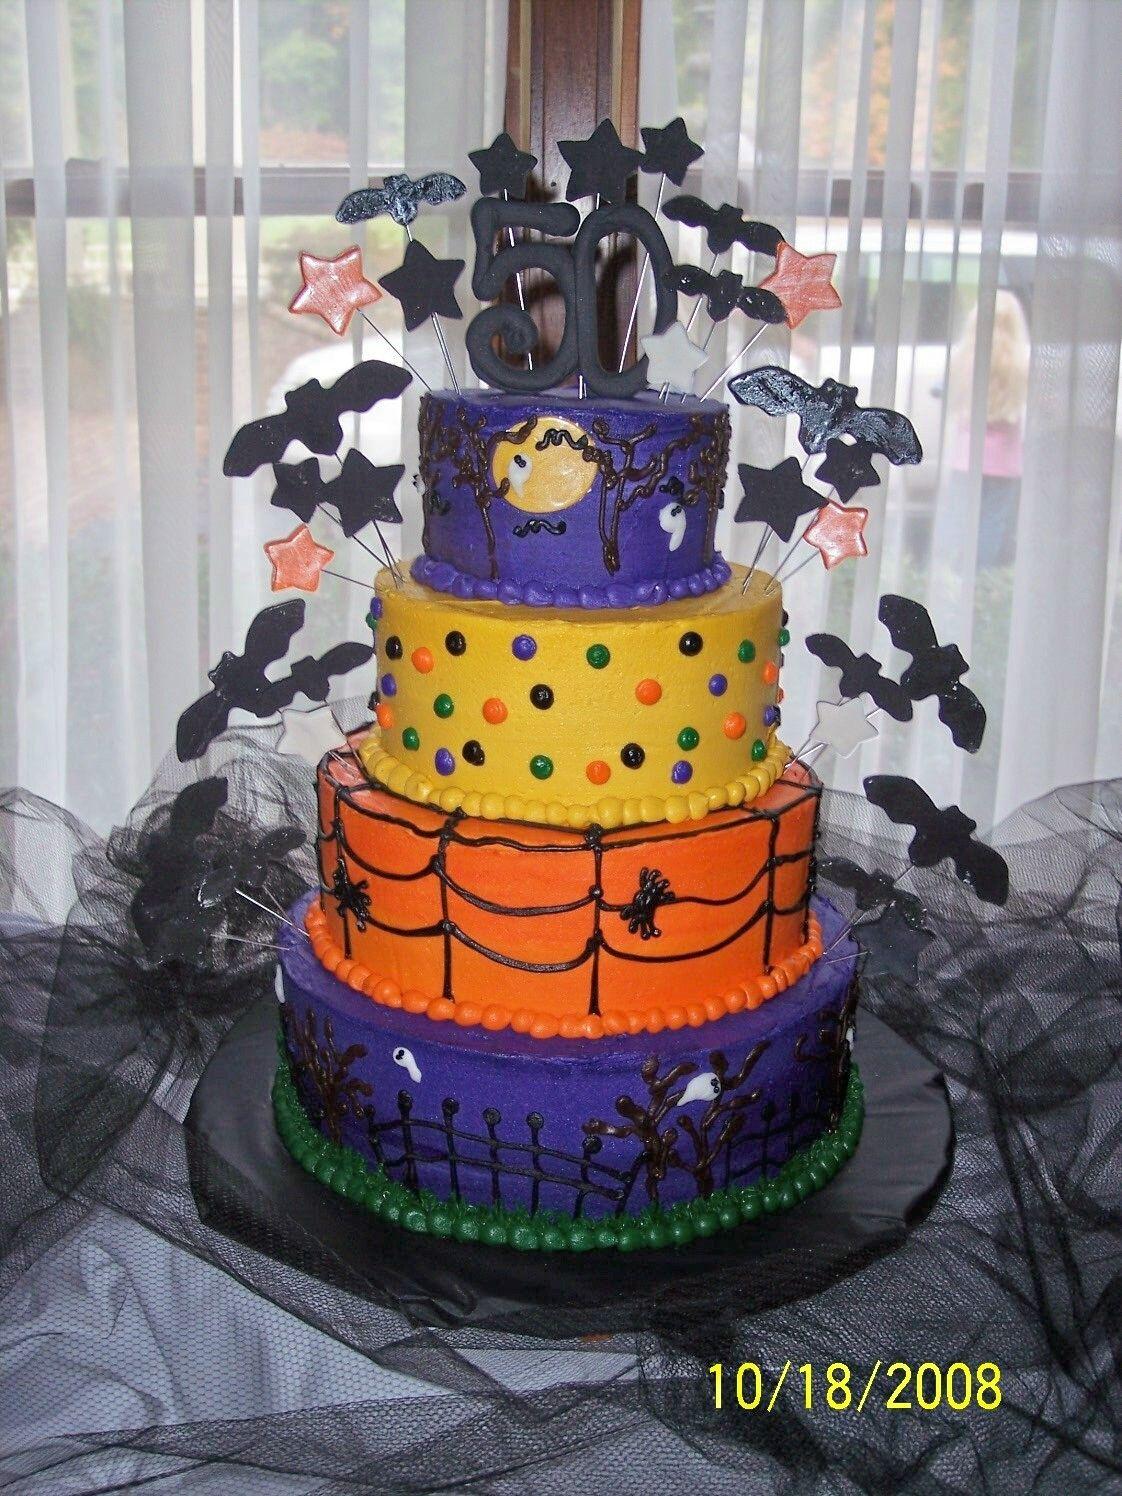 Halloween Cakes | sheet cake $ 35 1 2 sheet cake $ 45 | Halloween ...